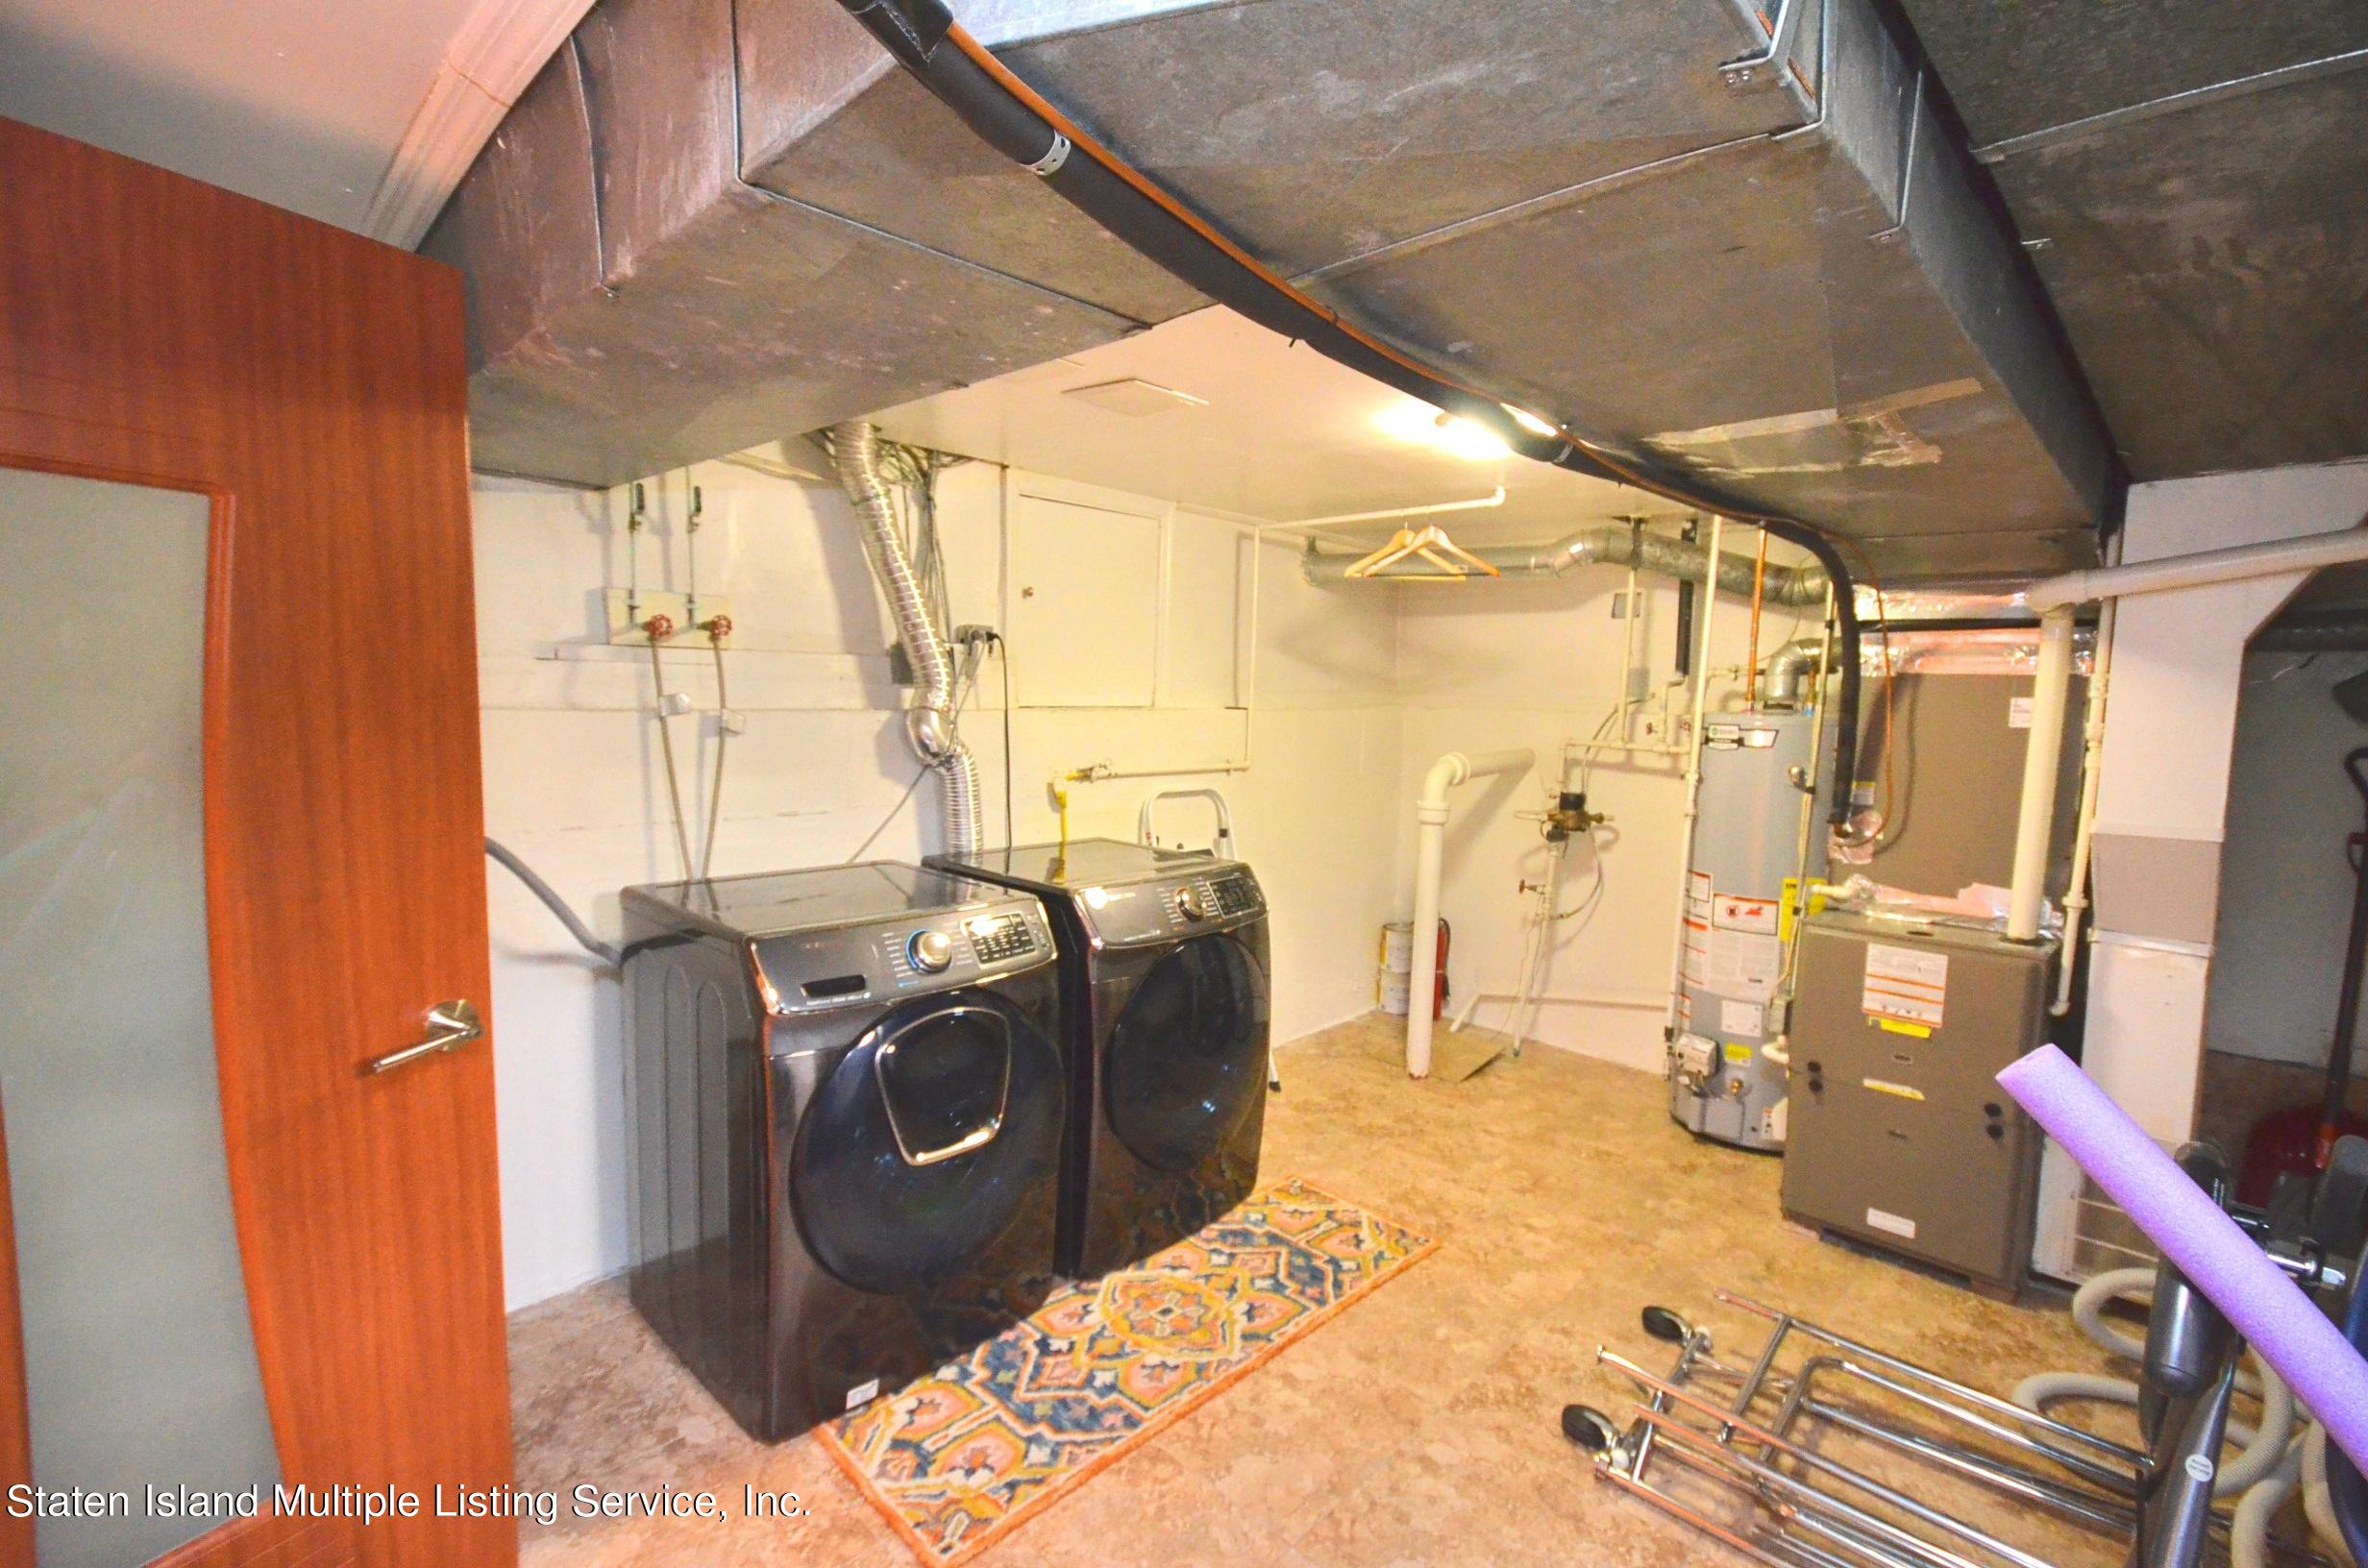 Single Family - Detached 48 Ocean Terrace  Staten Island, NY 10314, MLS-1142240-32